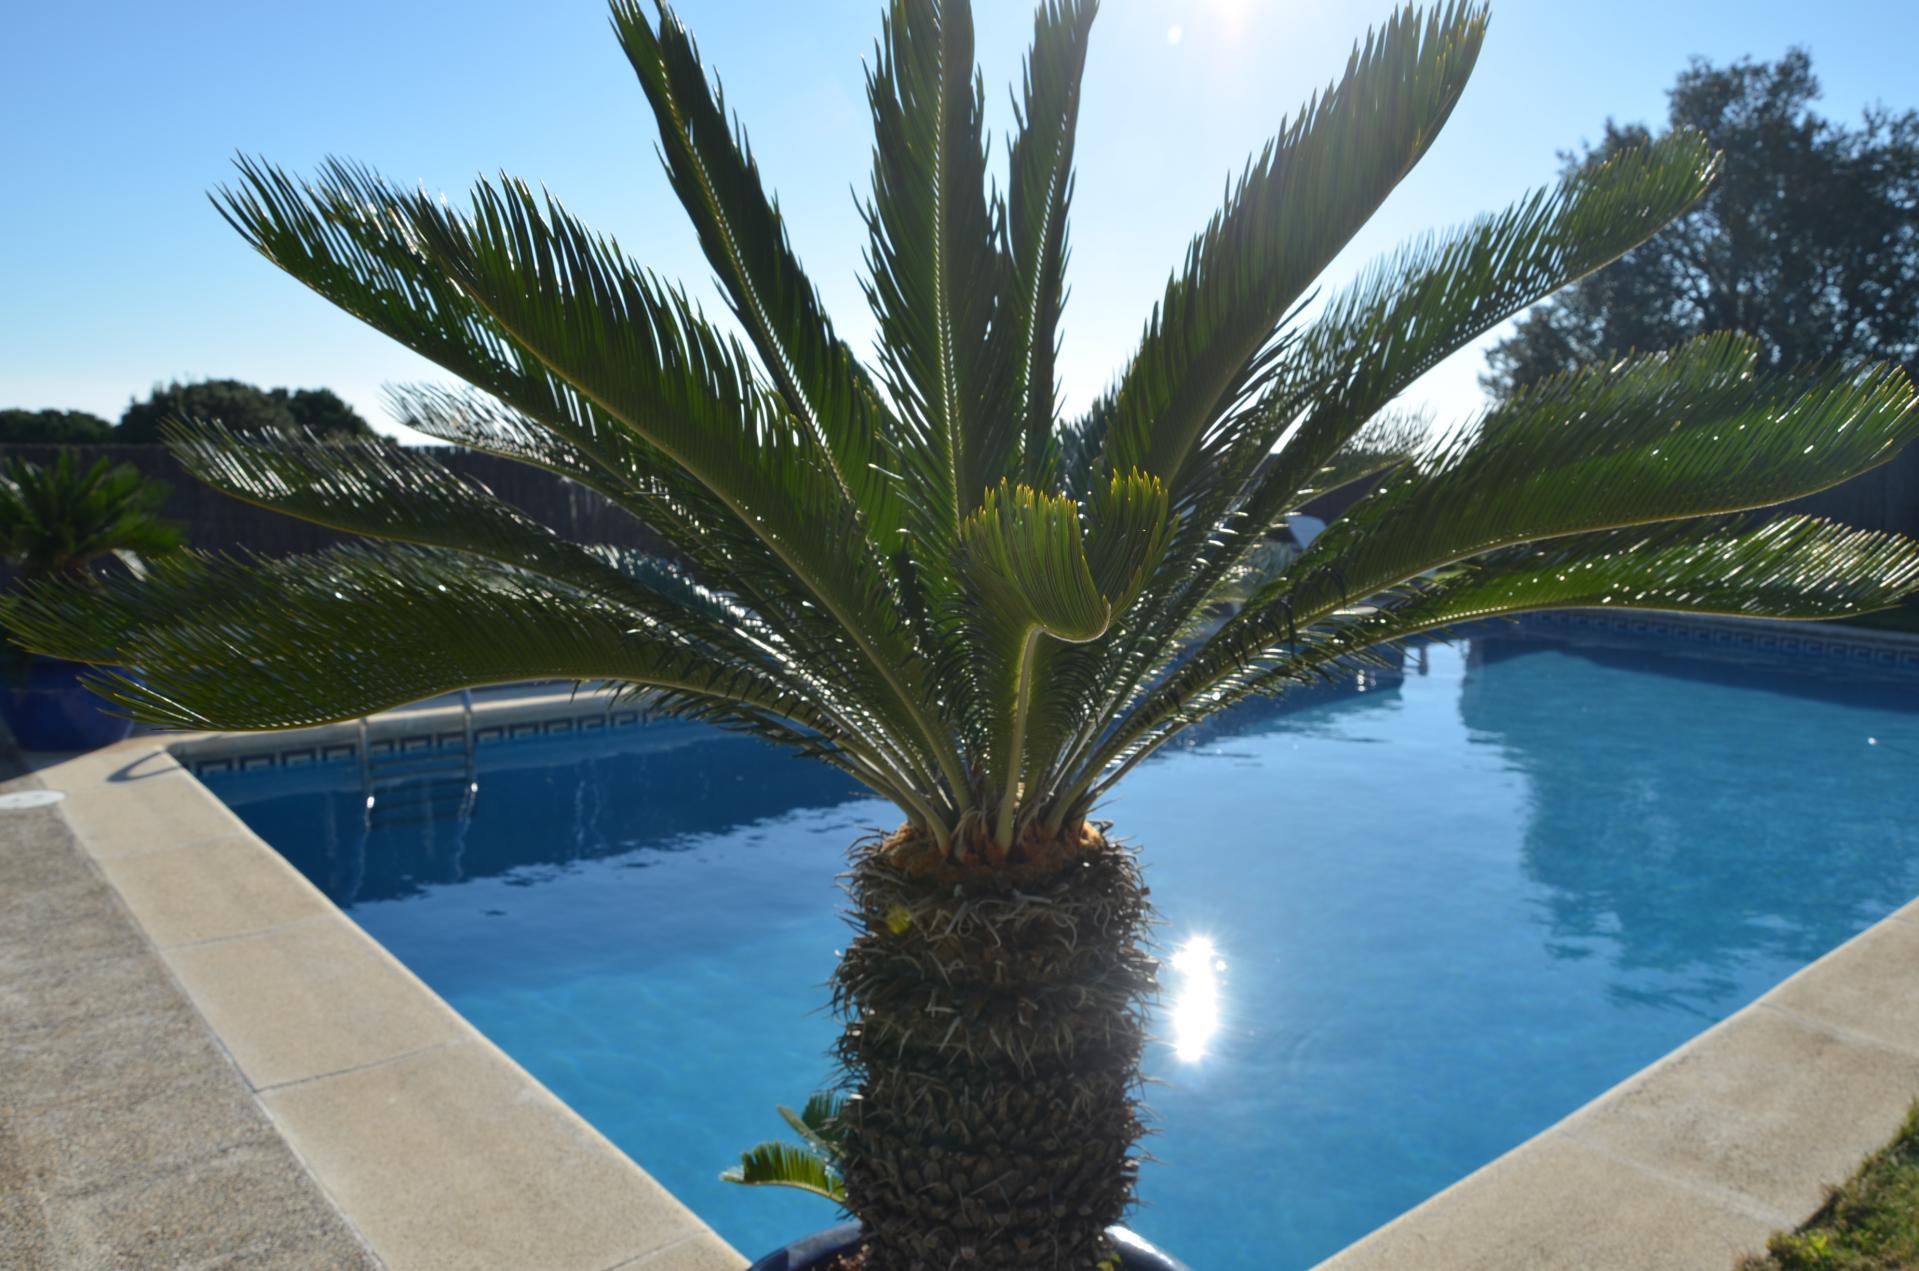 A palmierdsc 0165